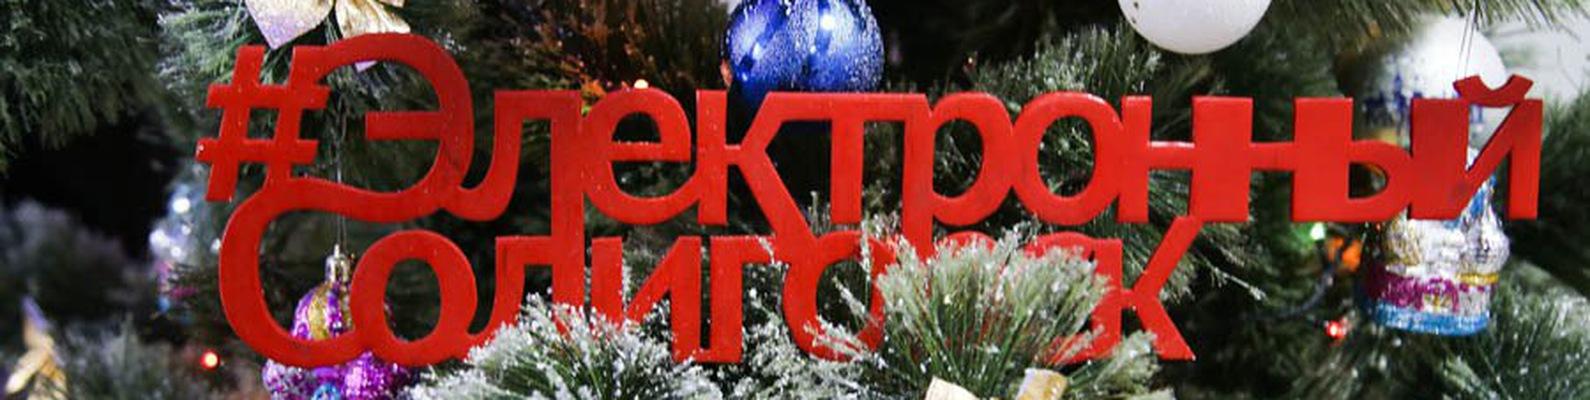 Снять путану Булавского ул. путаны метро Гостиный двор спб